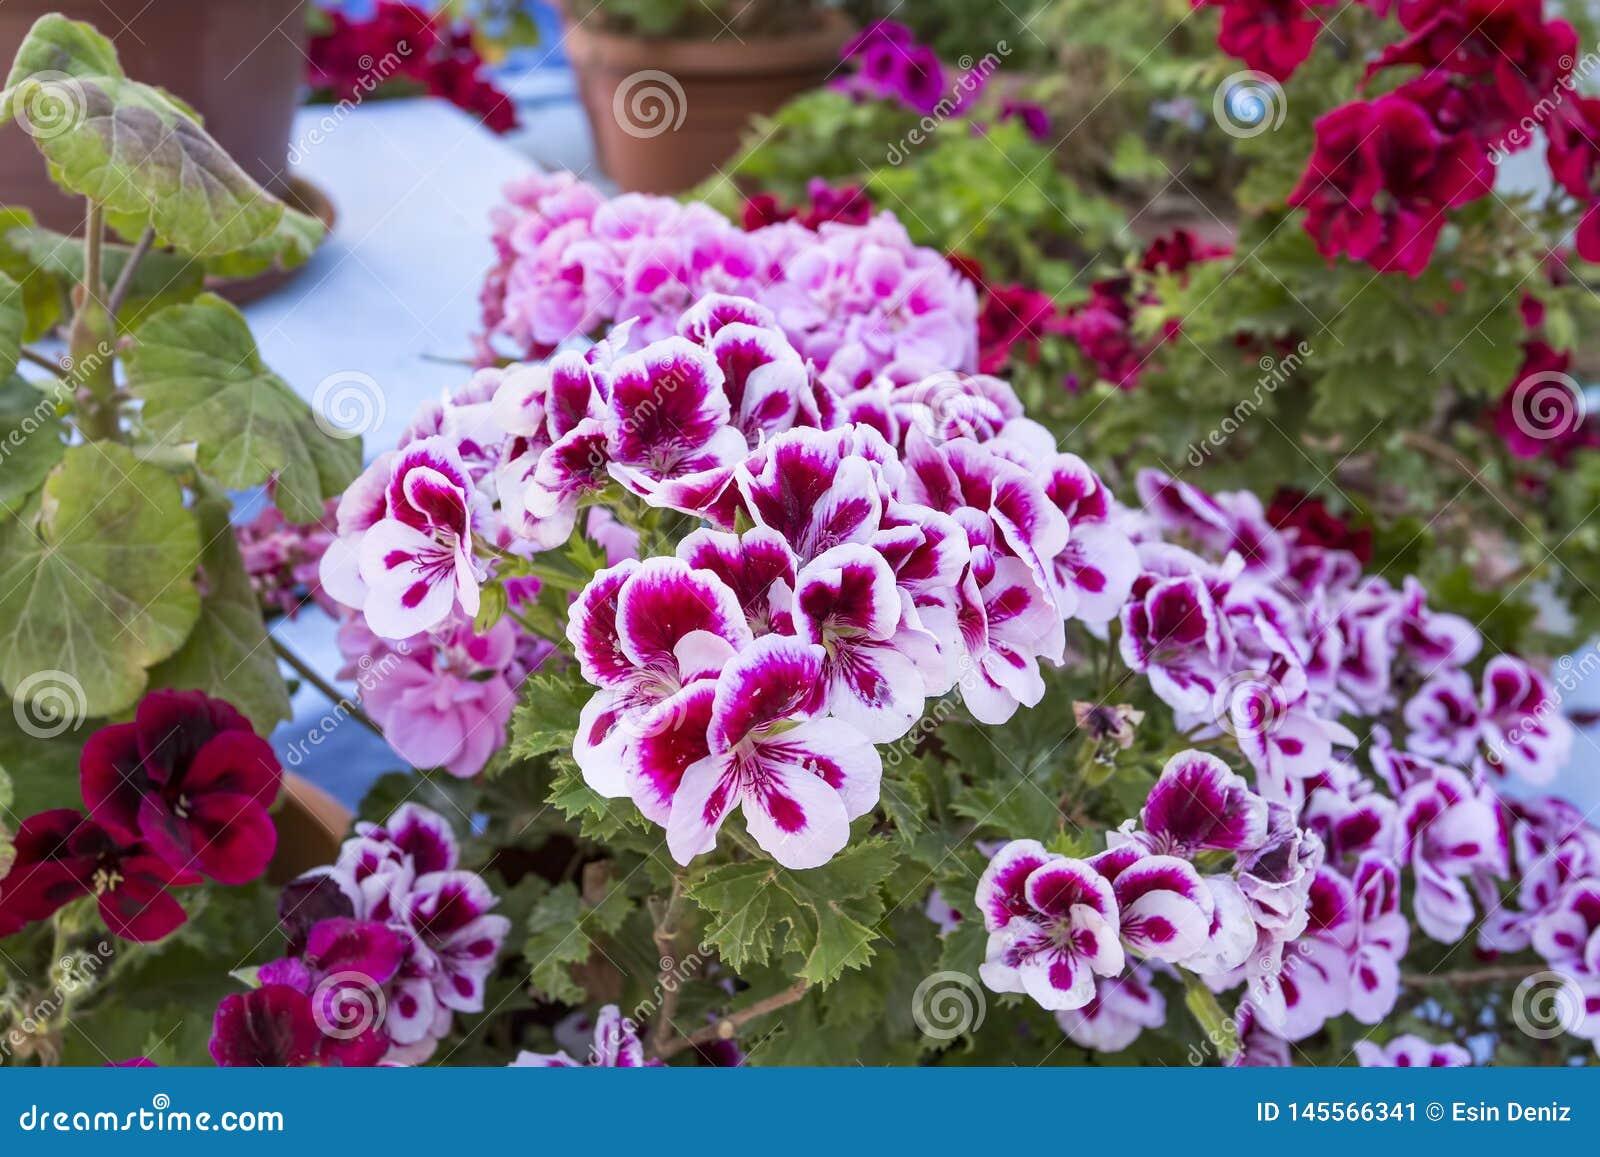 In pots geranium flowers fresh and beautiful